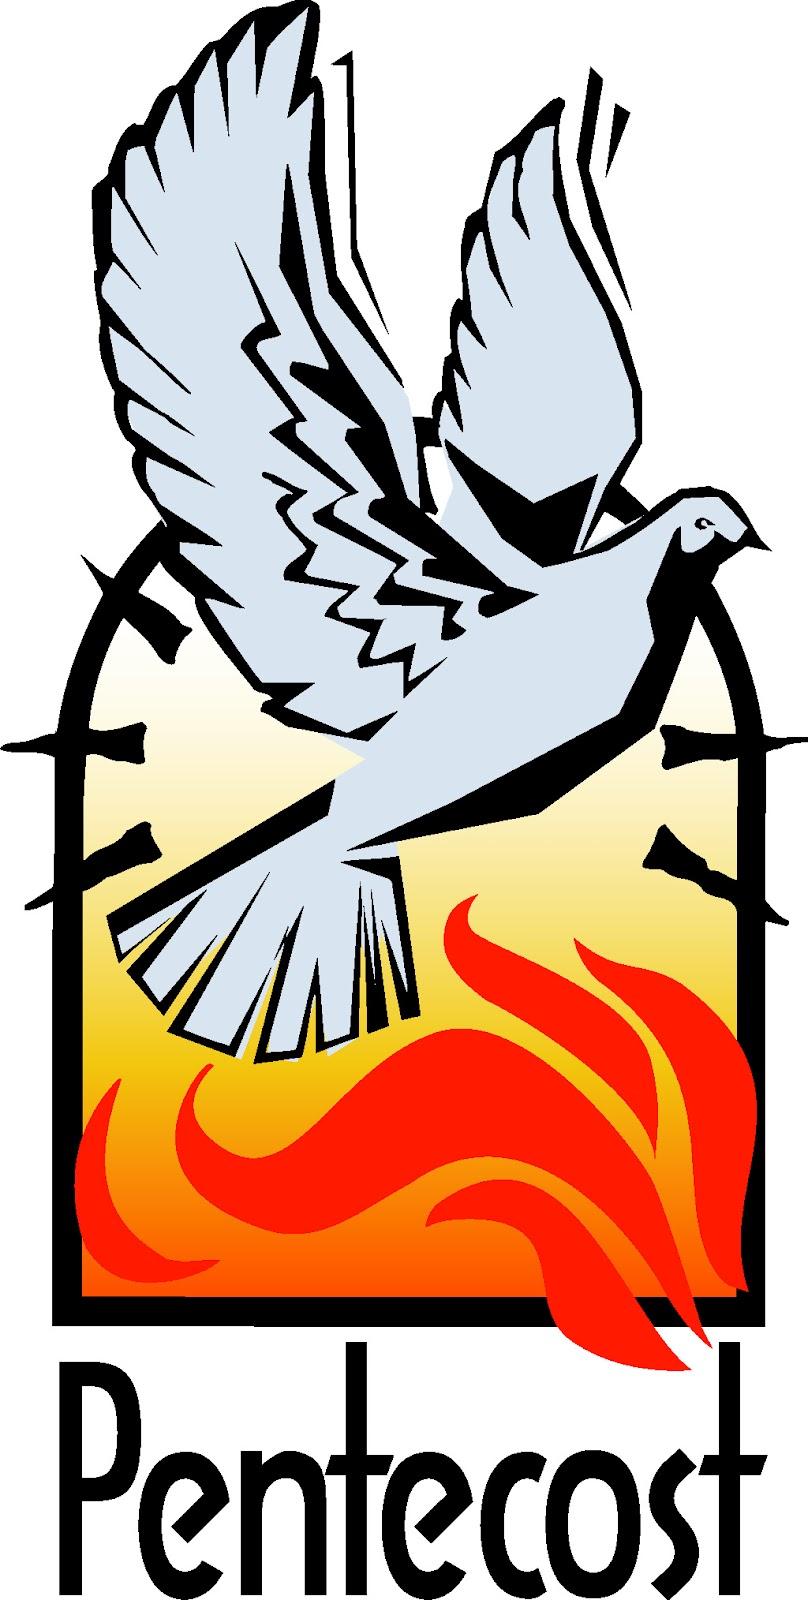 808x1600 Presbyterian Church Symbol Clip Art Cliparts